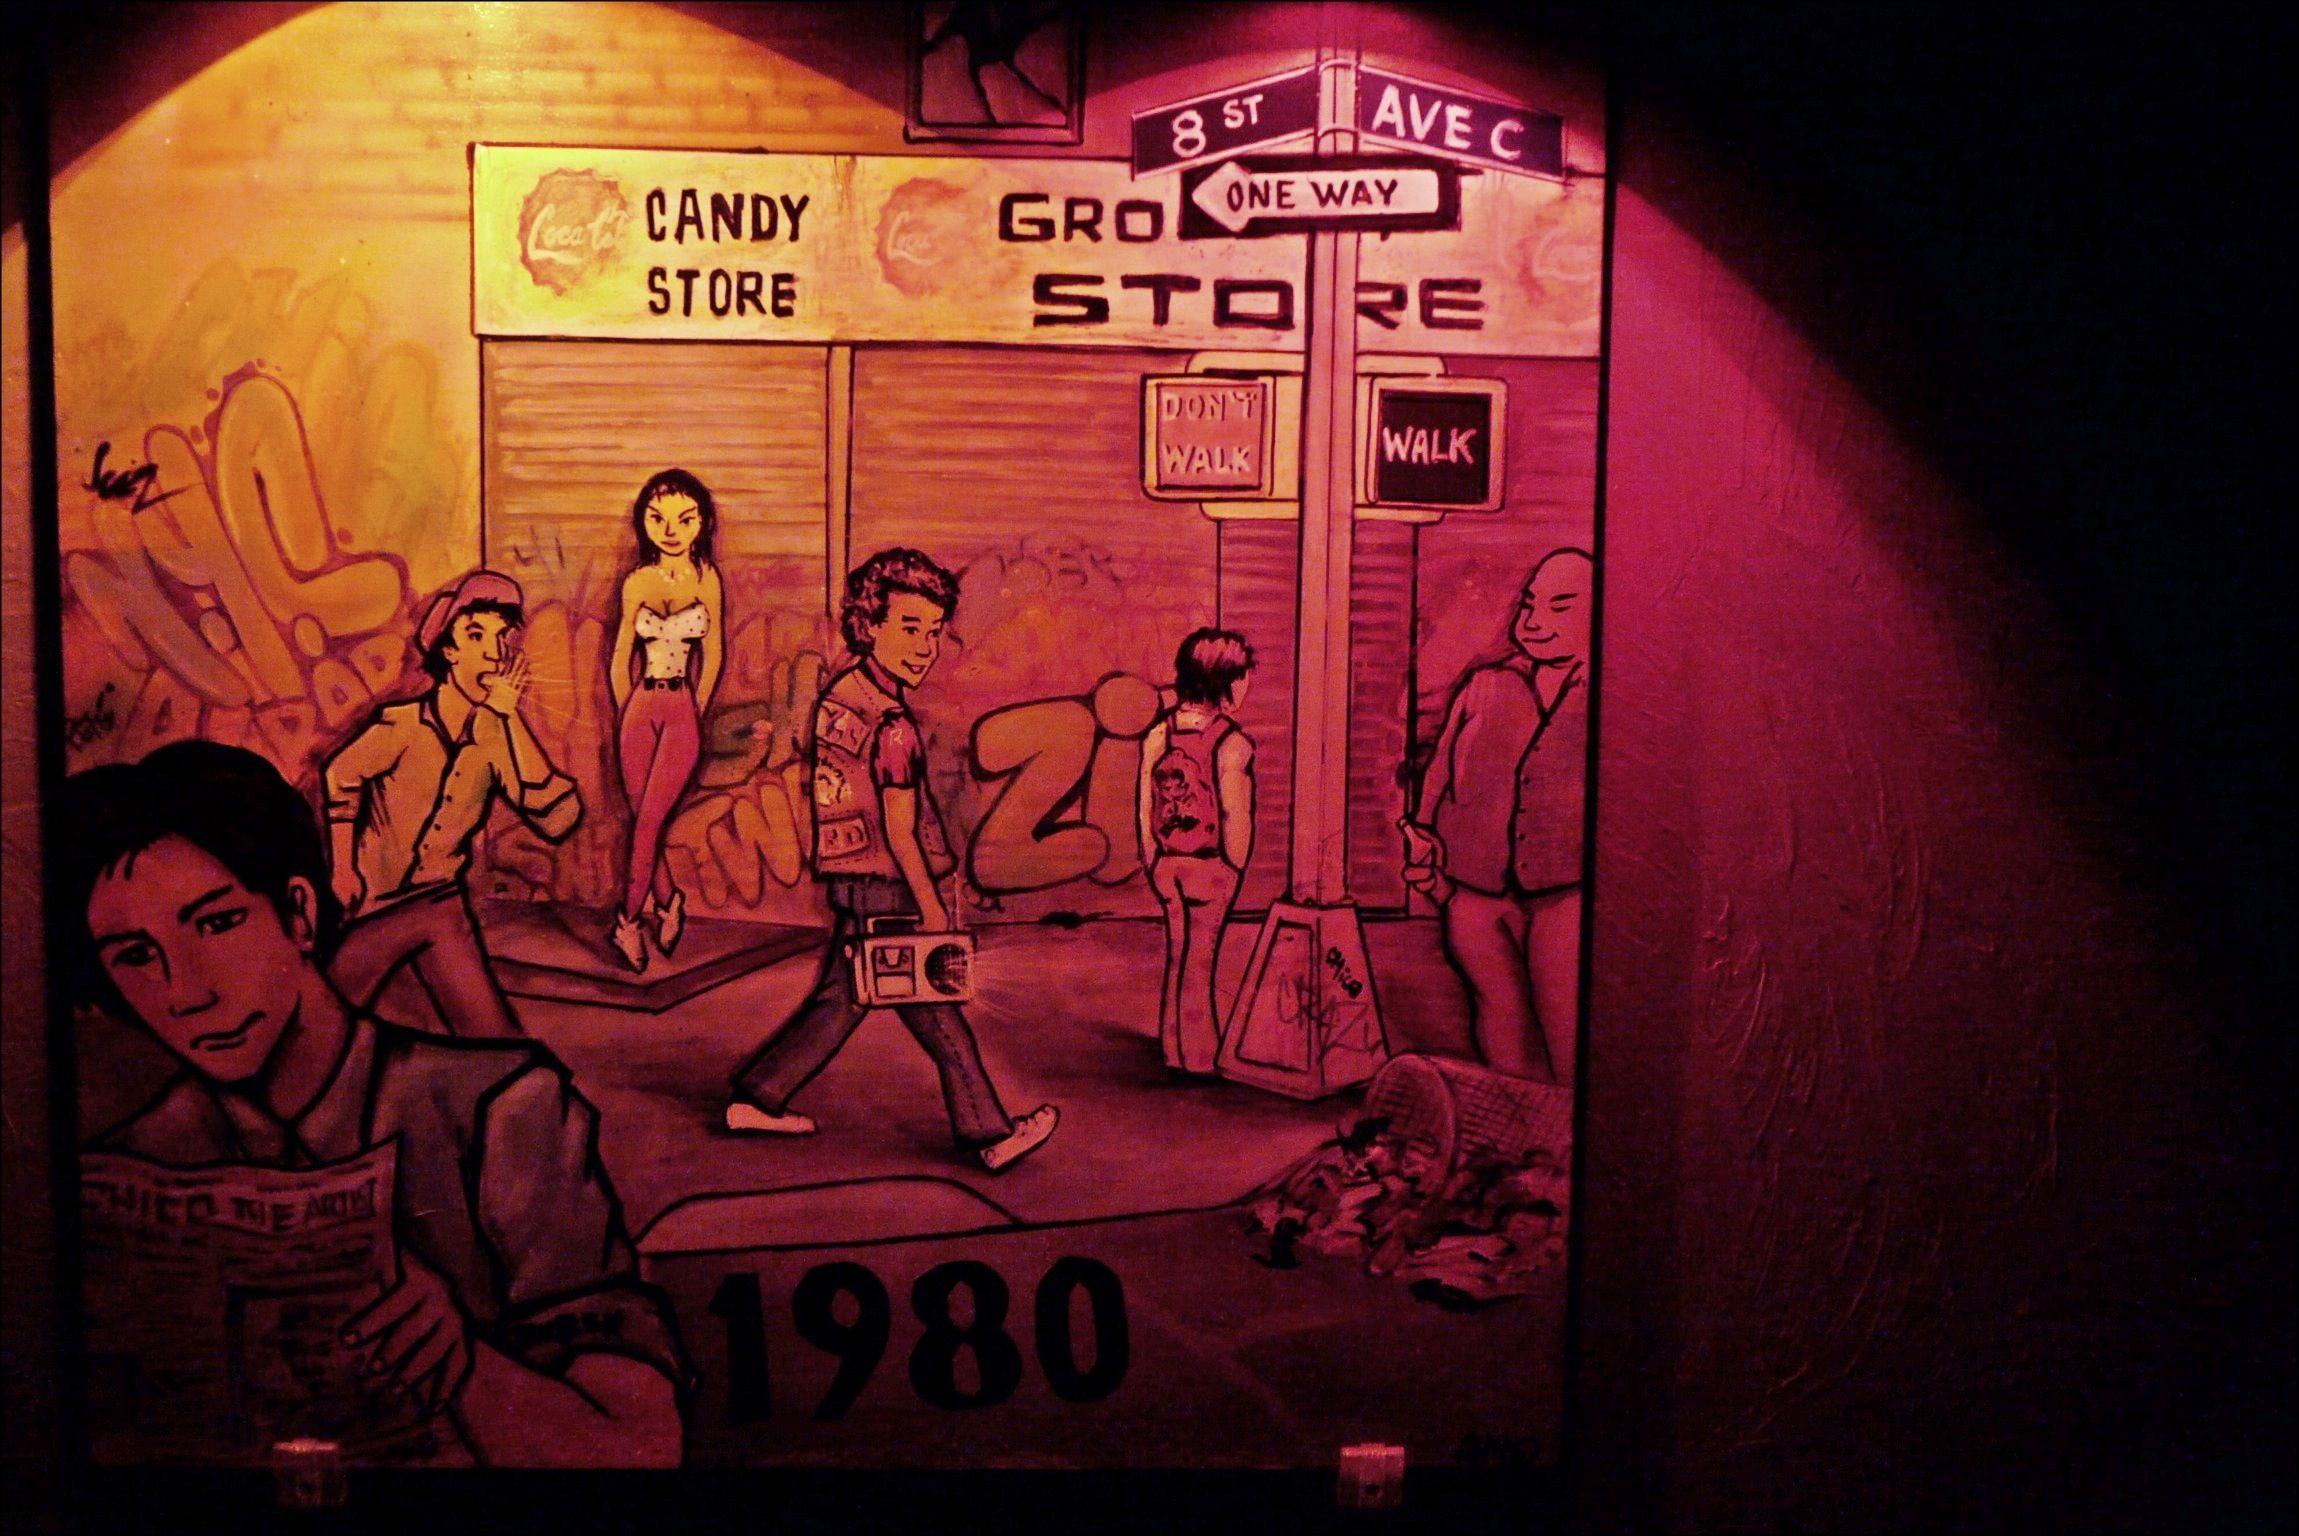 Speakeasy artwork captures LES in the 80s. | Neon signs